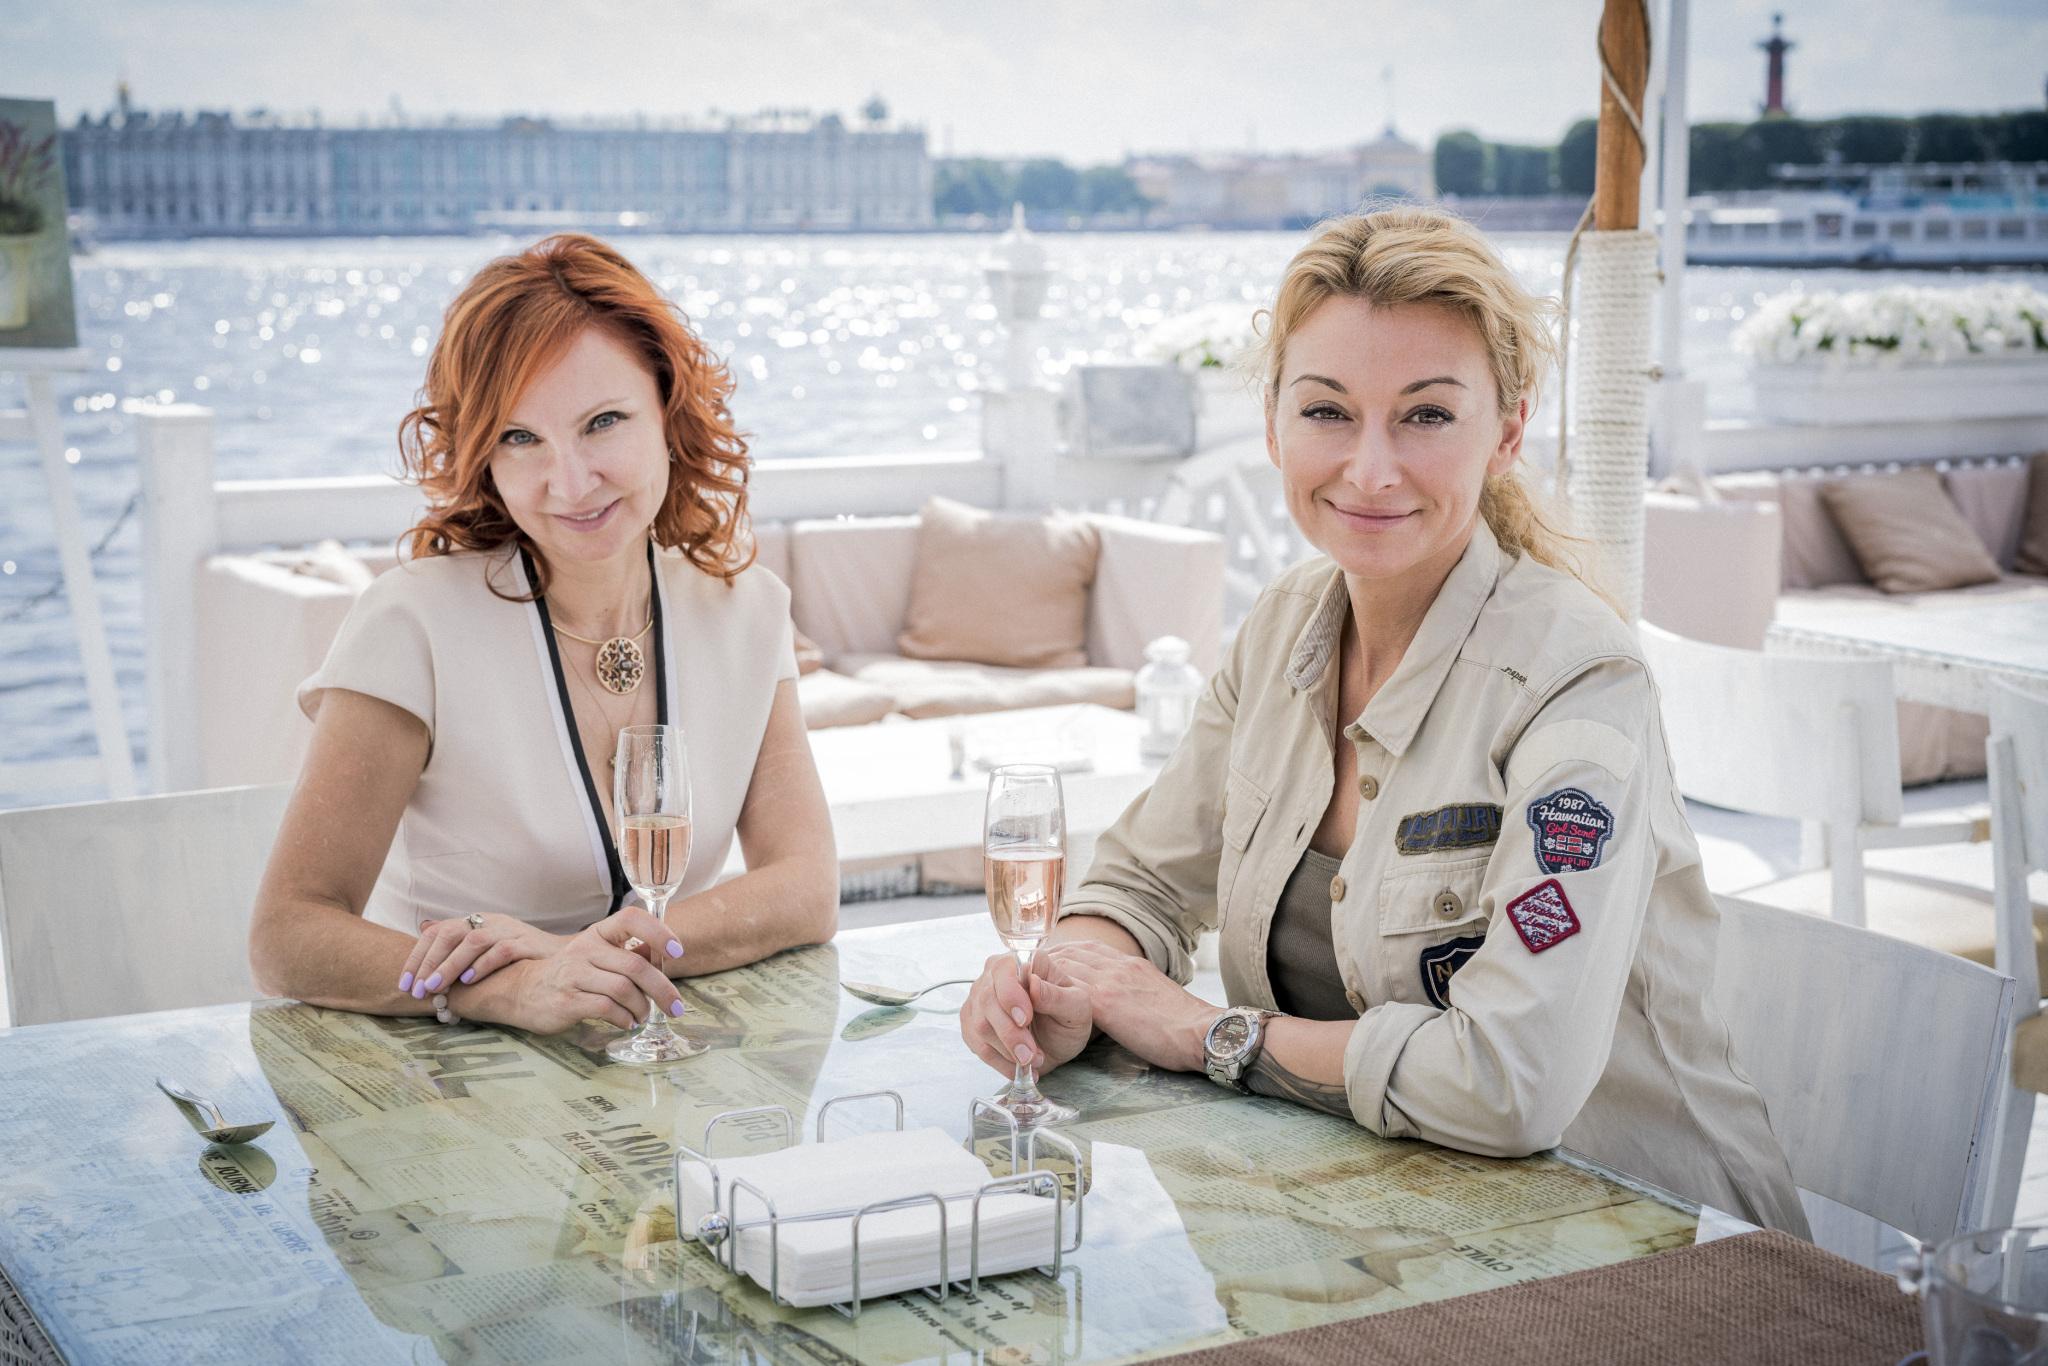 Odcinek 2, sezon 8, Rosja